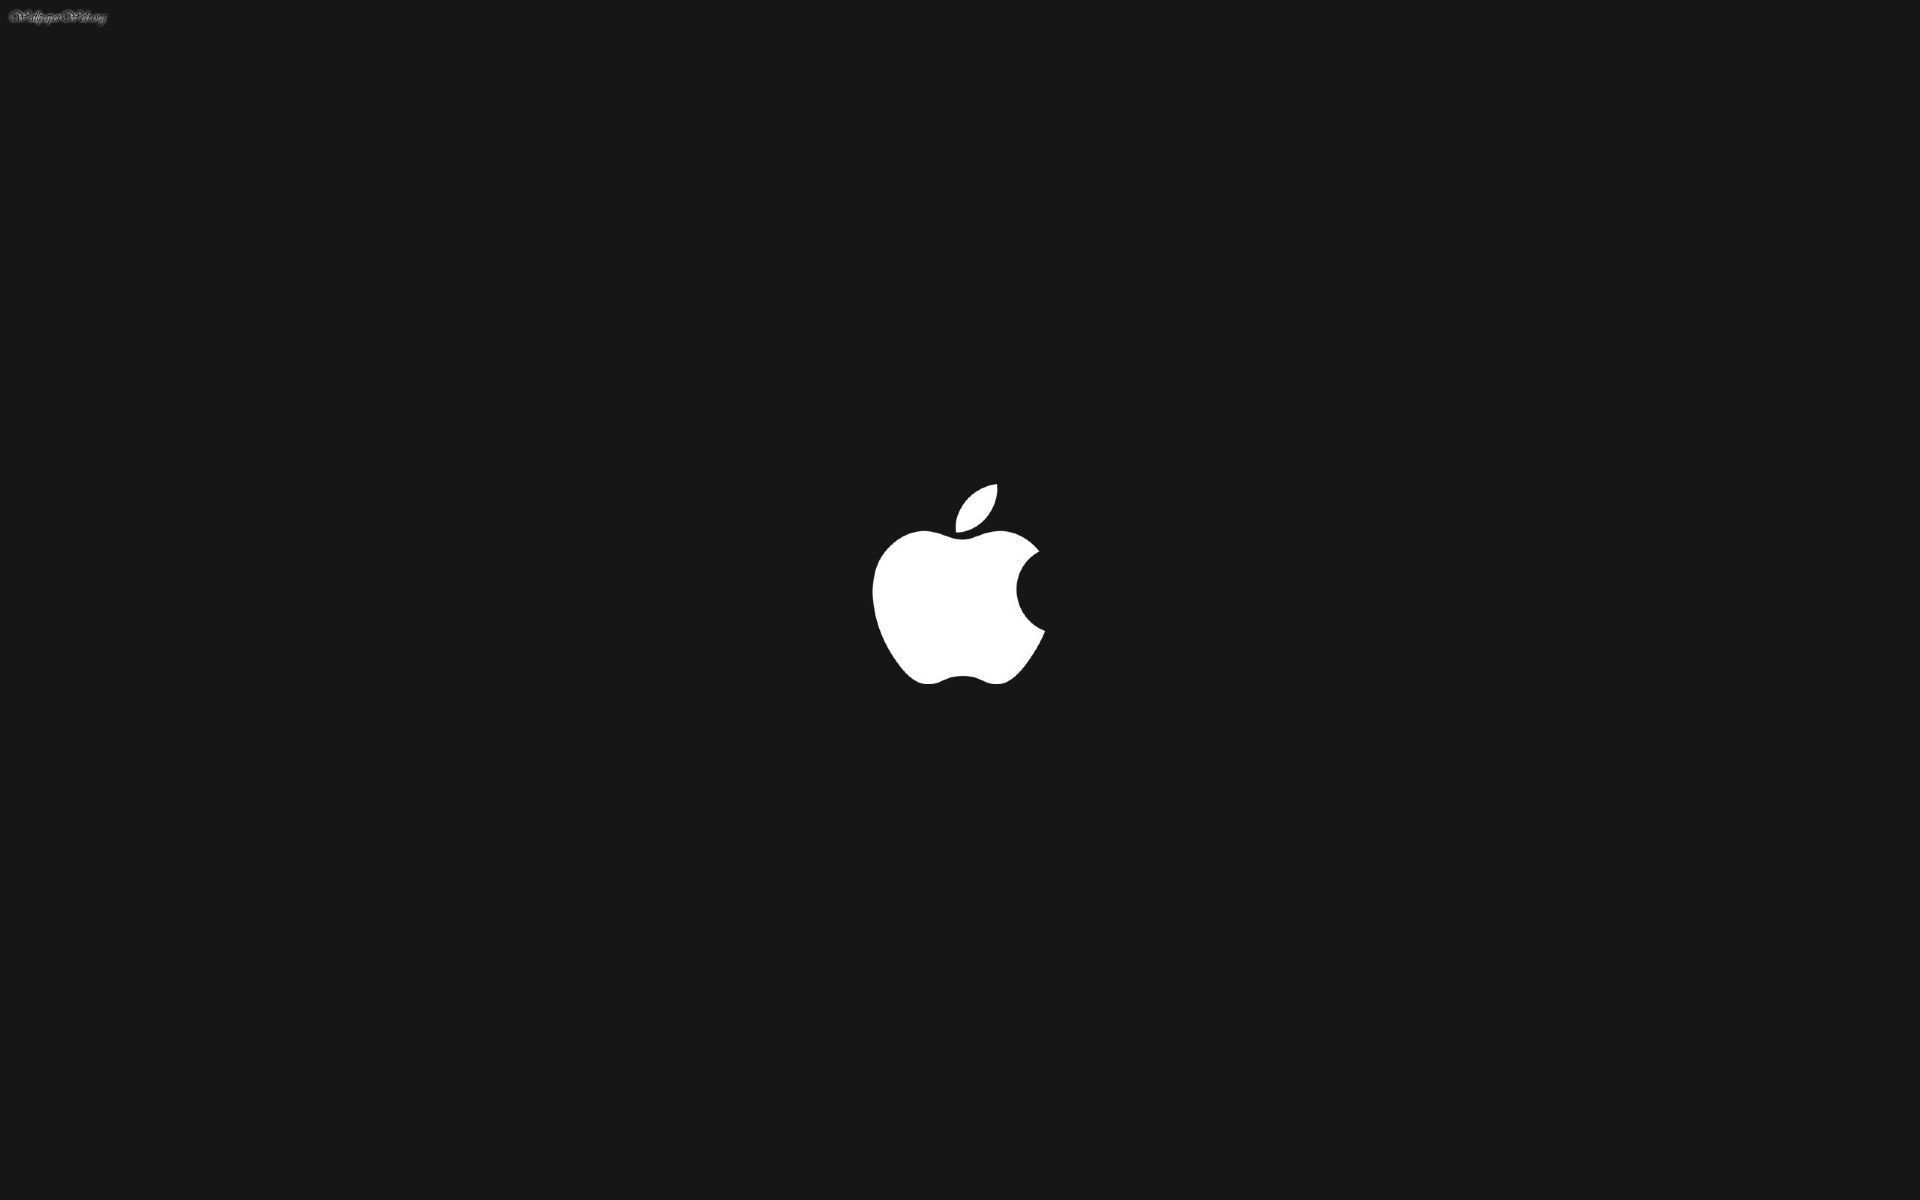 Logo High Black Resolution Apple Retina Computer wallpapers HD 1920x1200